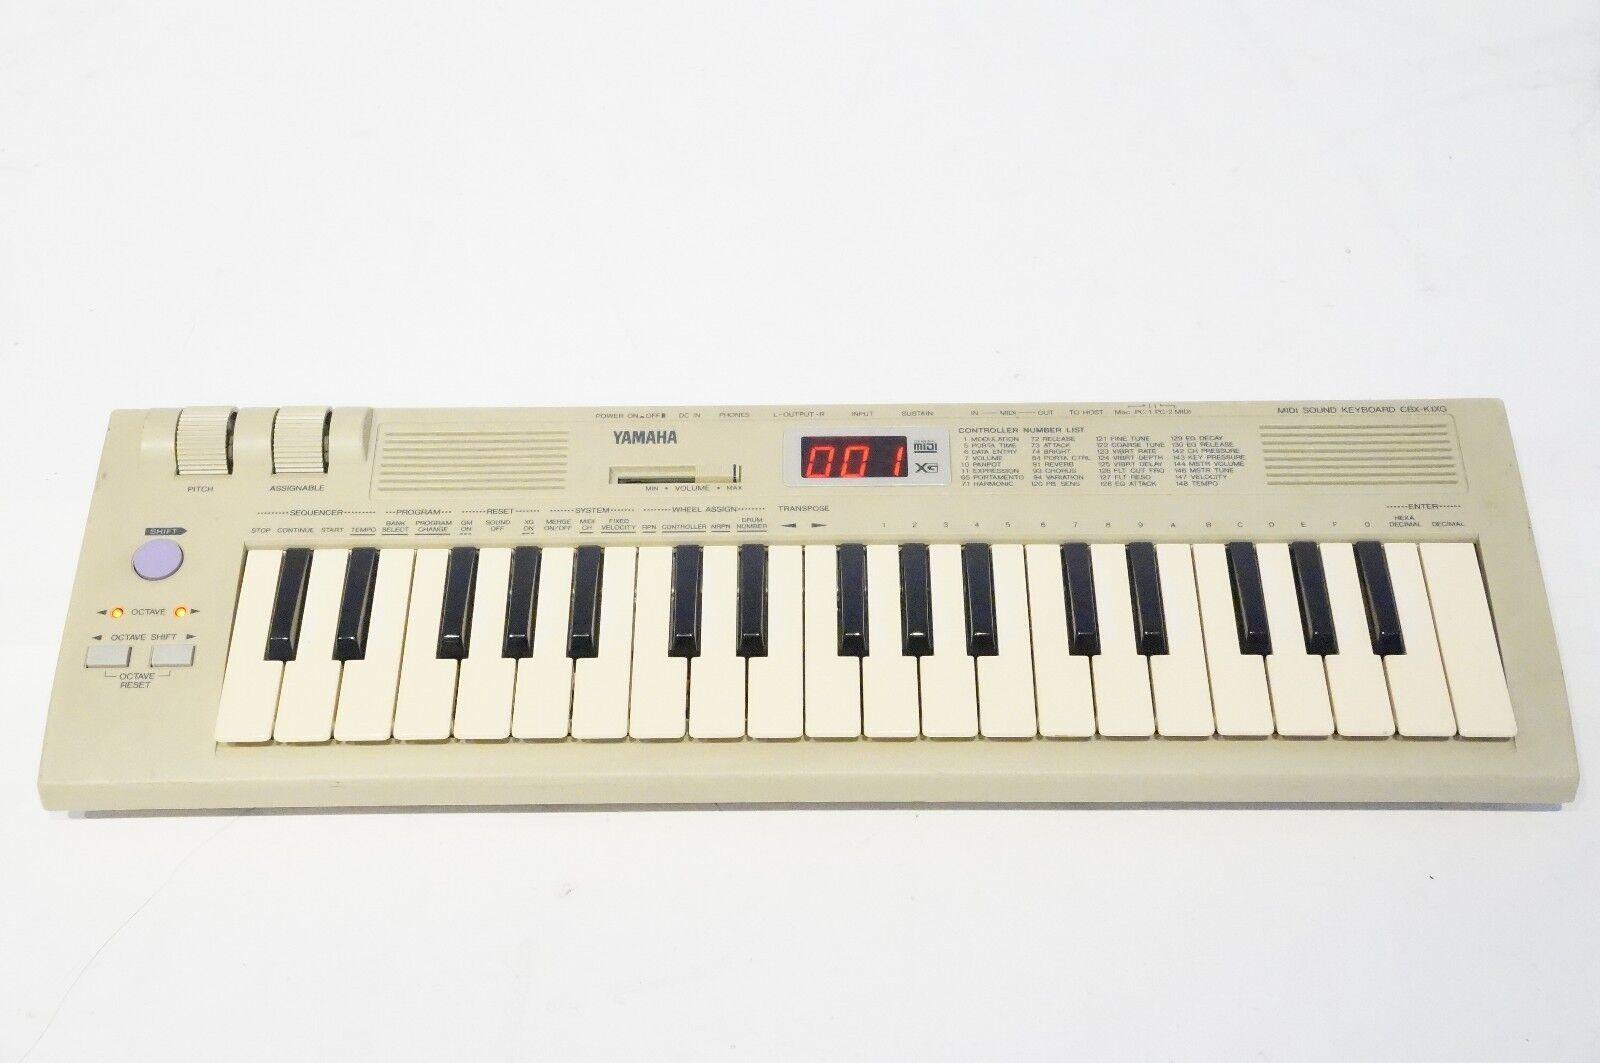 YAMAHA CBX-K1XG 37 MINI MIDI SOUND KEYBOARD MU50 Sound Module Build-in Speaker